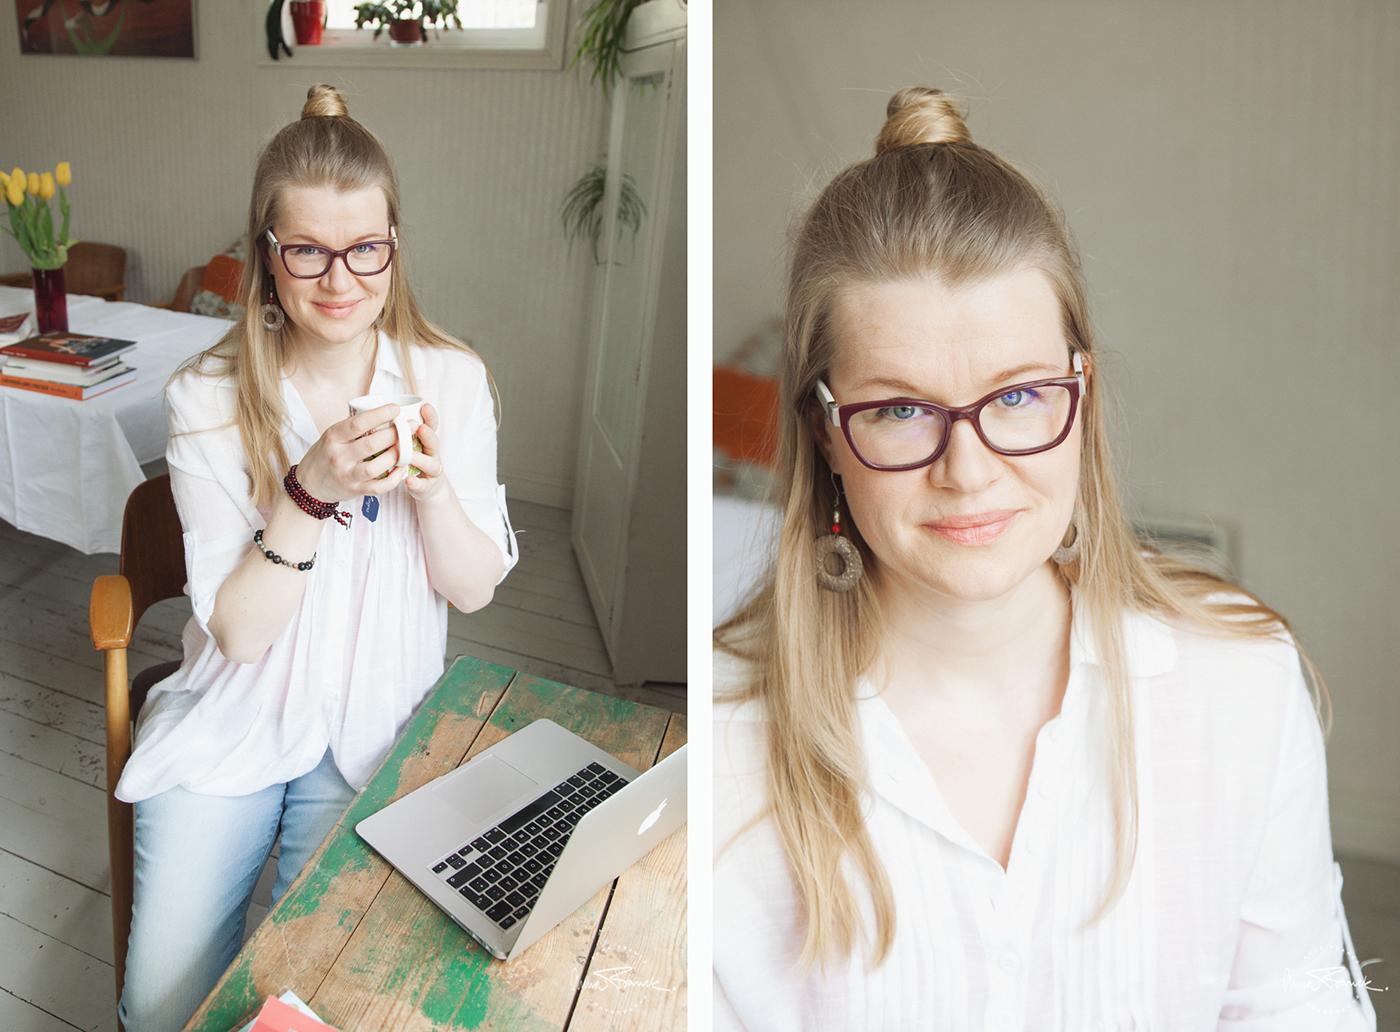 anna, franck, photography, annafranck, portrait, weddings, porträttfotograf, photographer, stockholm, åbo, turku, pargas, parainen, muotokuva, businessbranding, softlight, natural, light, onlocation, hemma